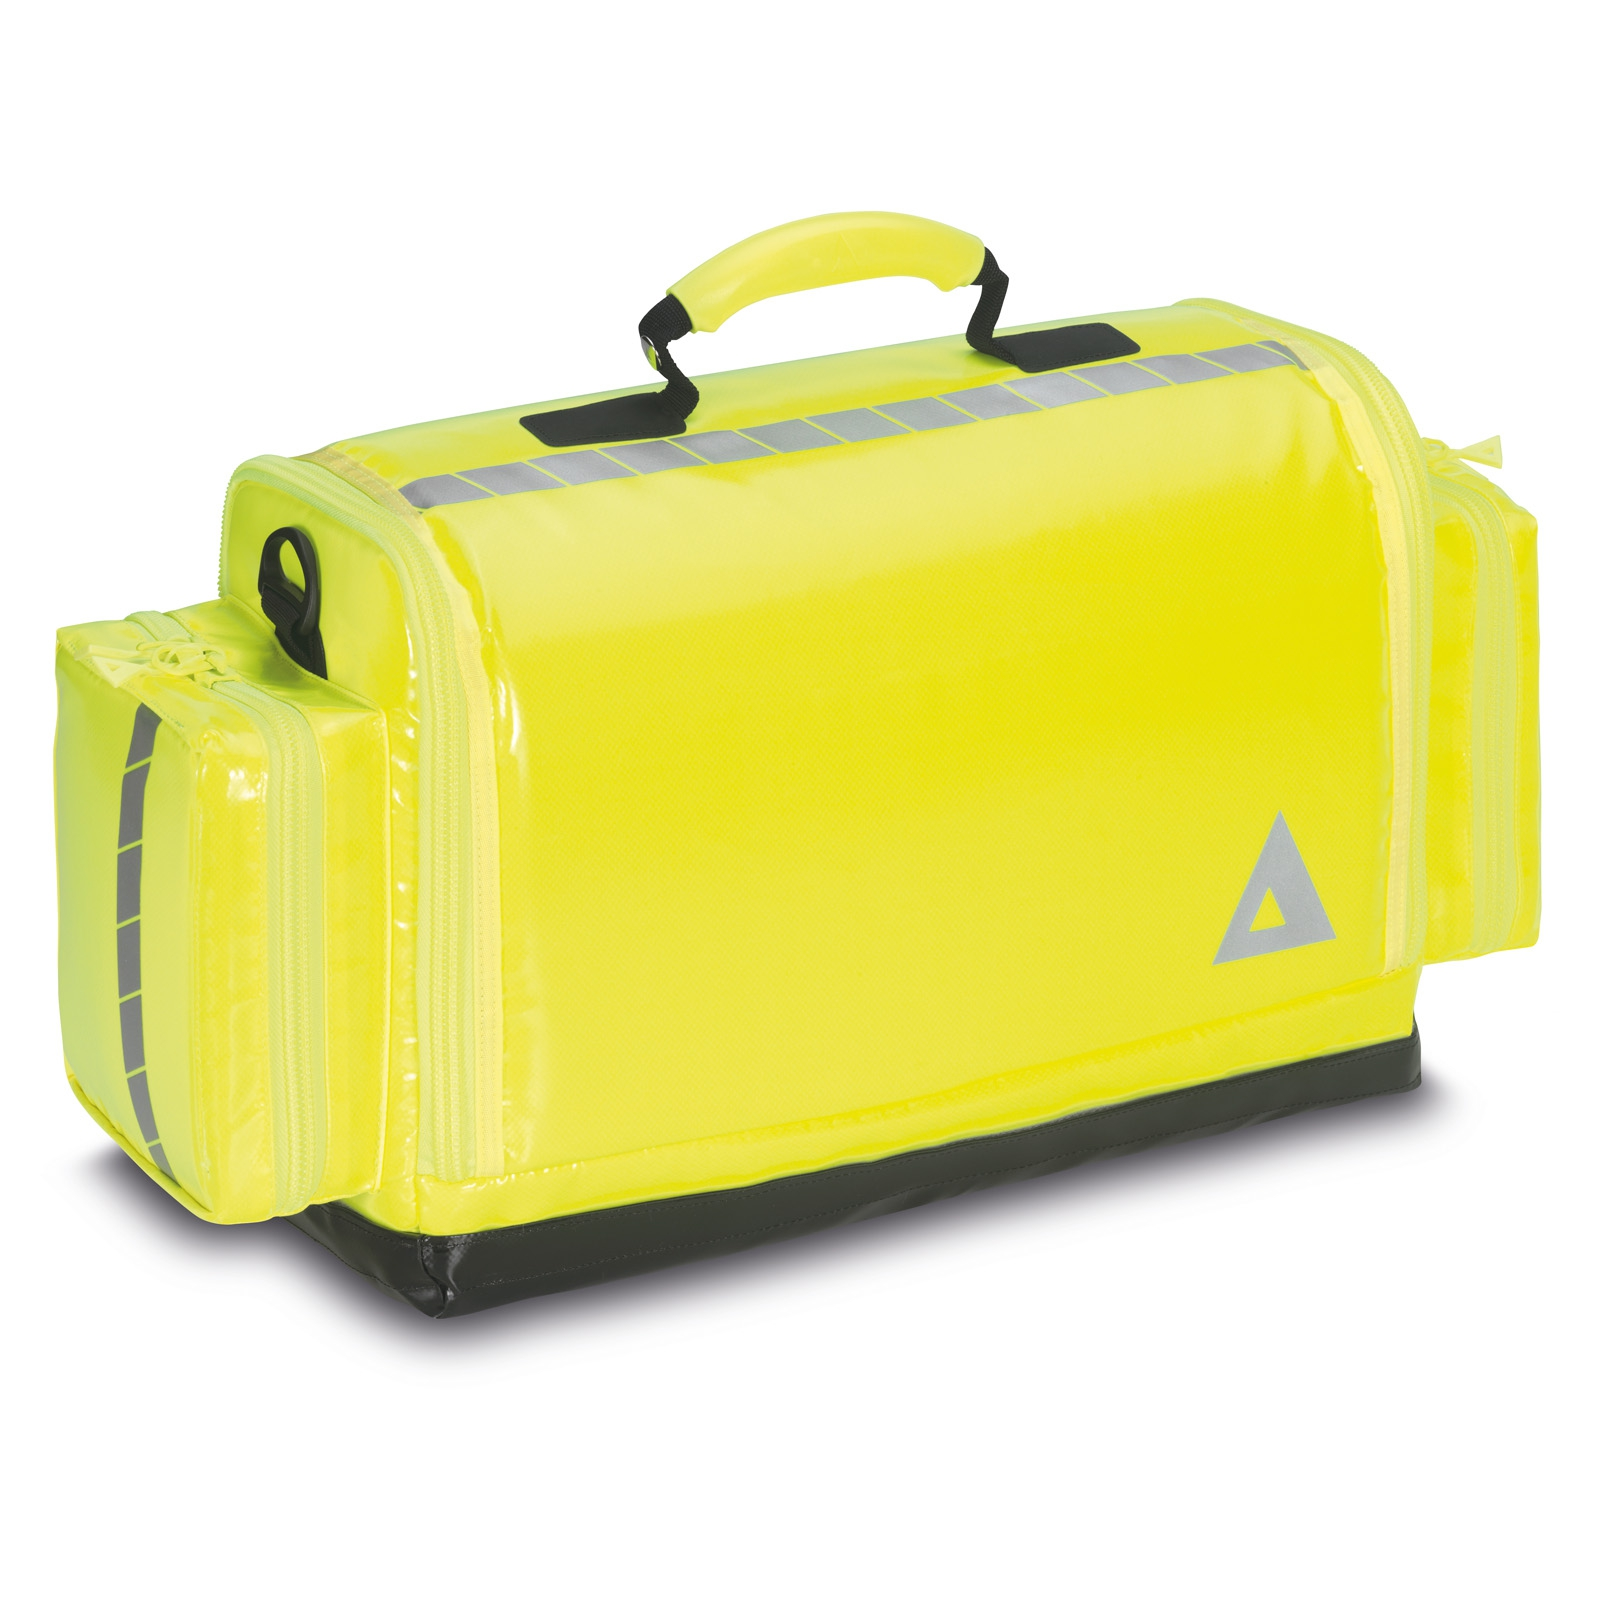 Child emergency bag Pax-plan